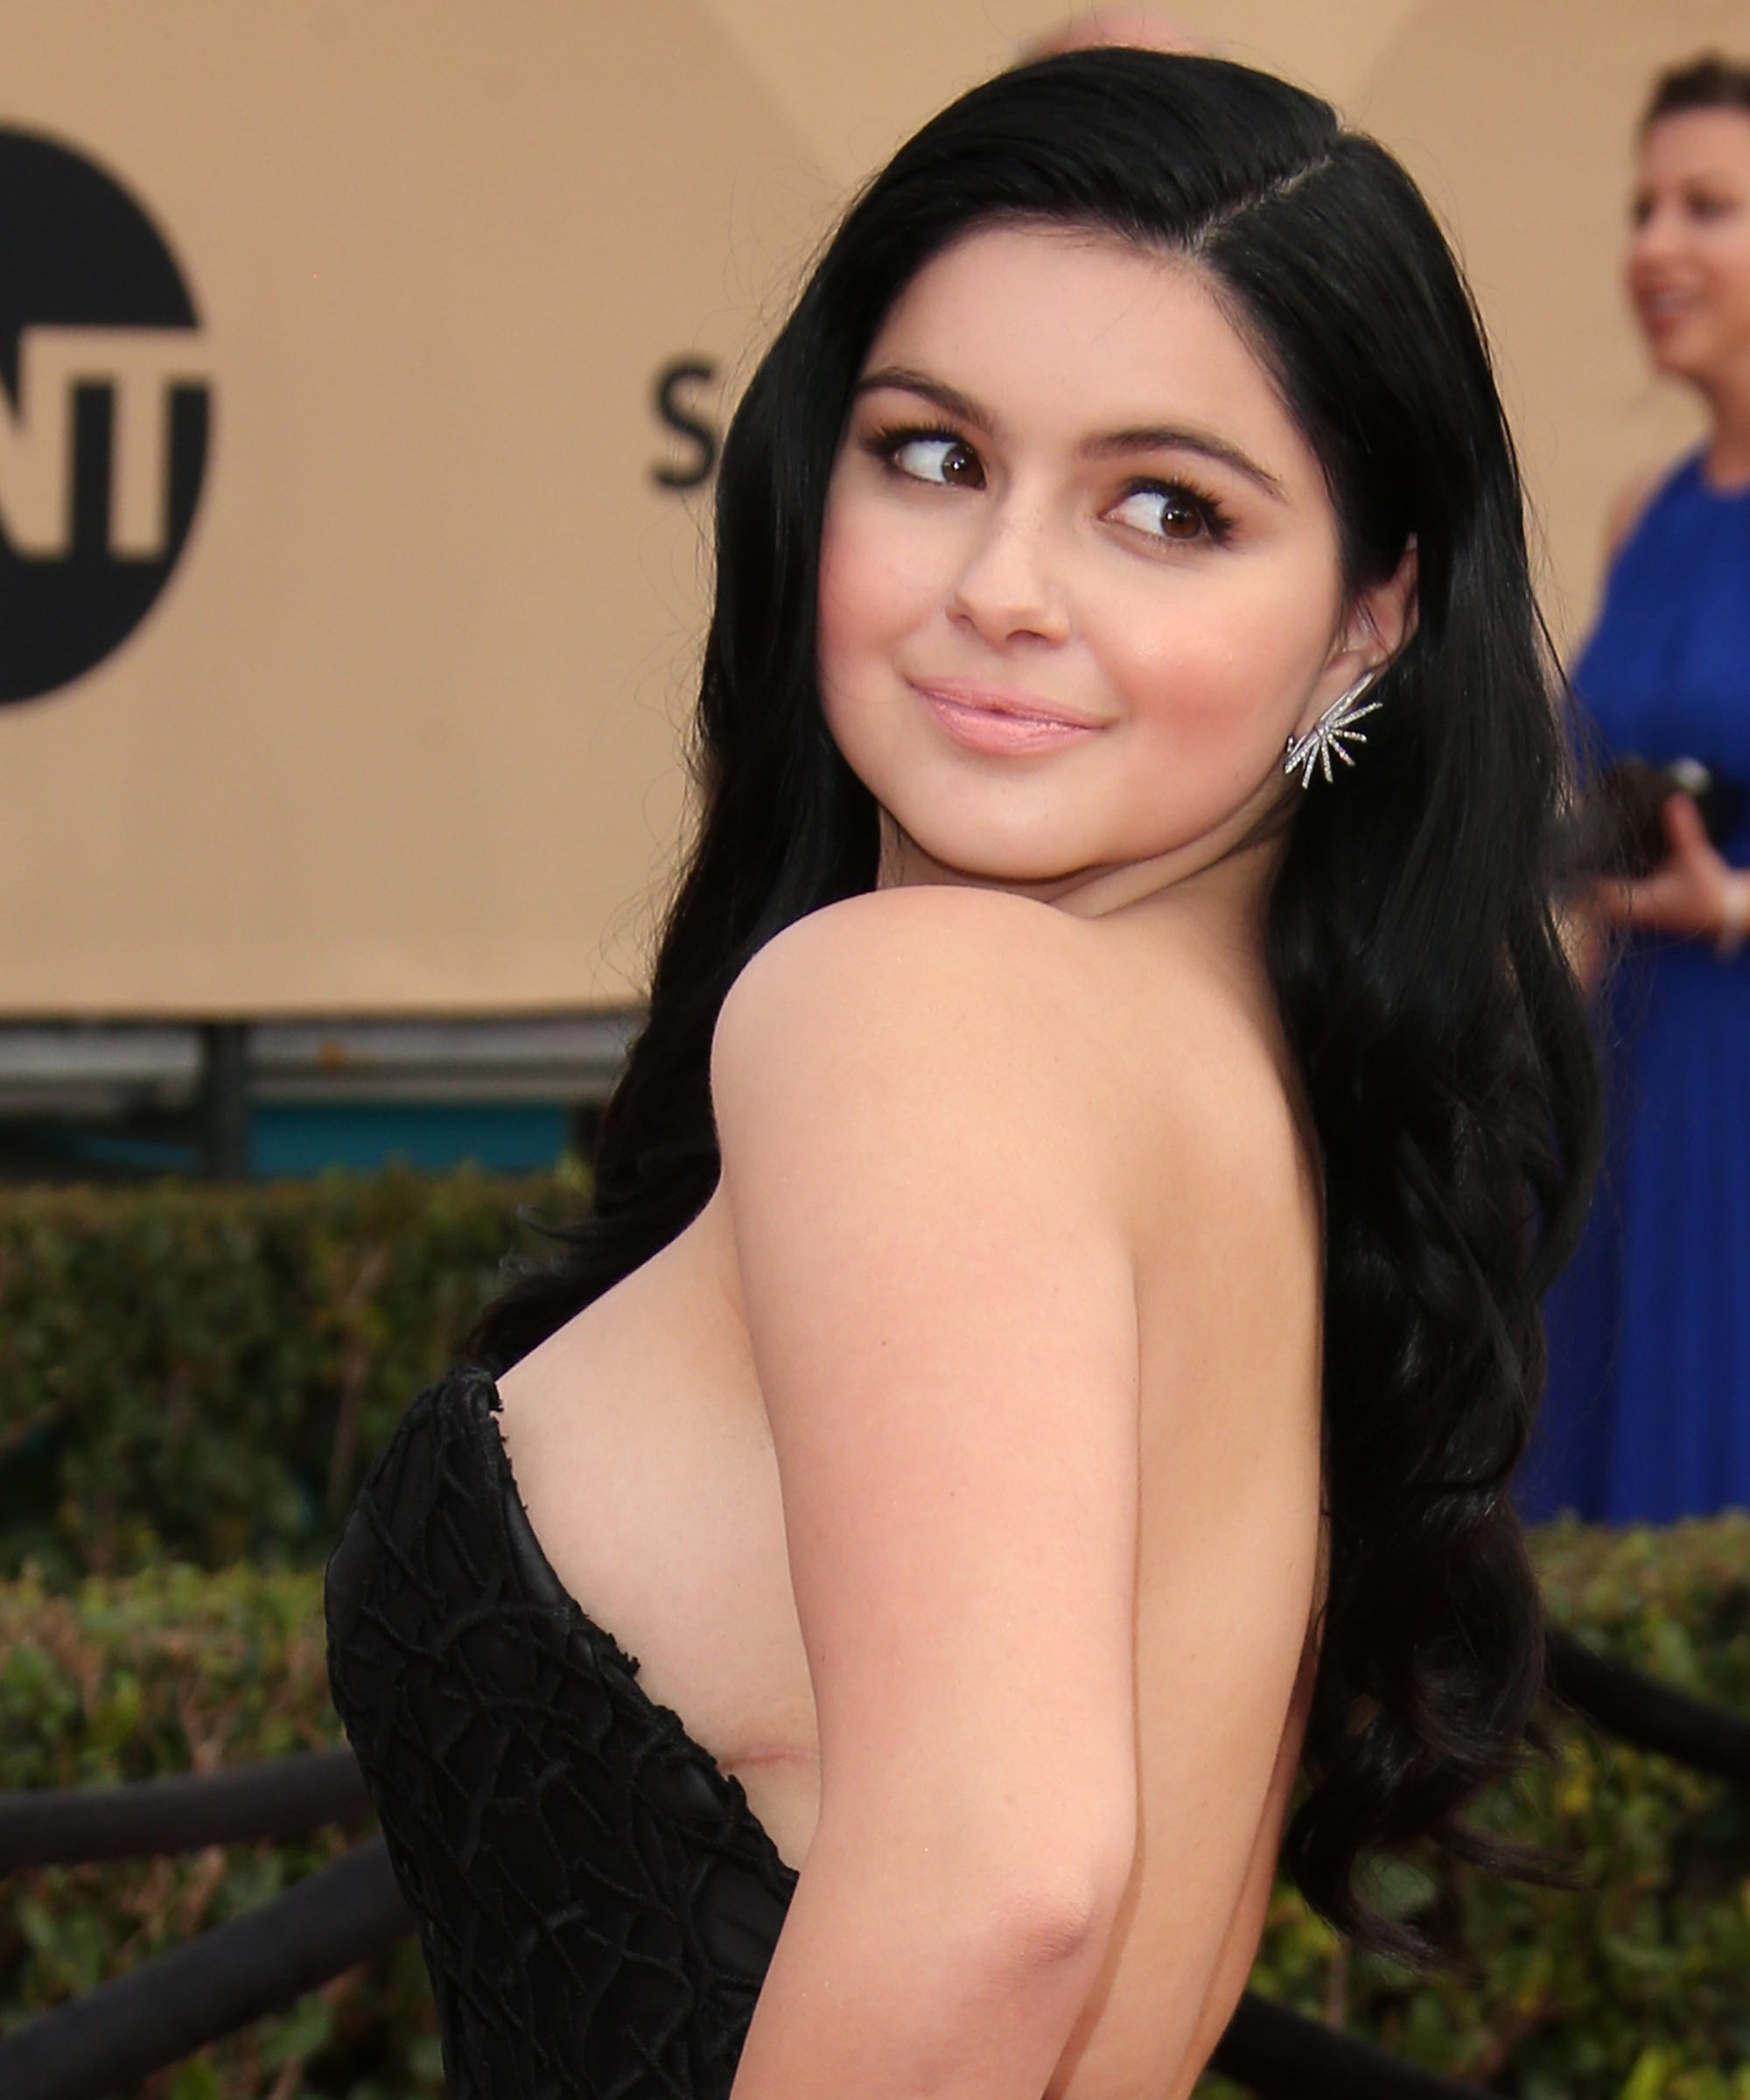 Celebrites StCelebritesi Schroeder nudes (95 photo), Tits, Leaked, Instagram, bra 2017